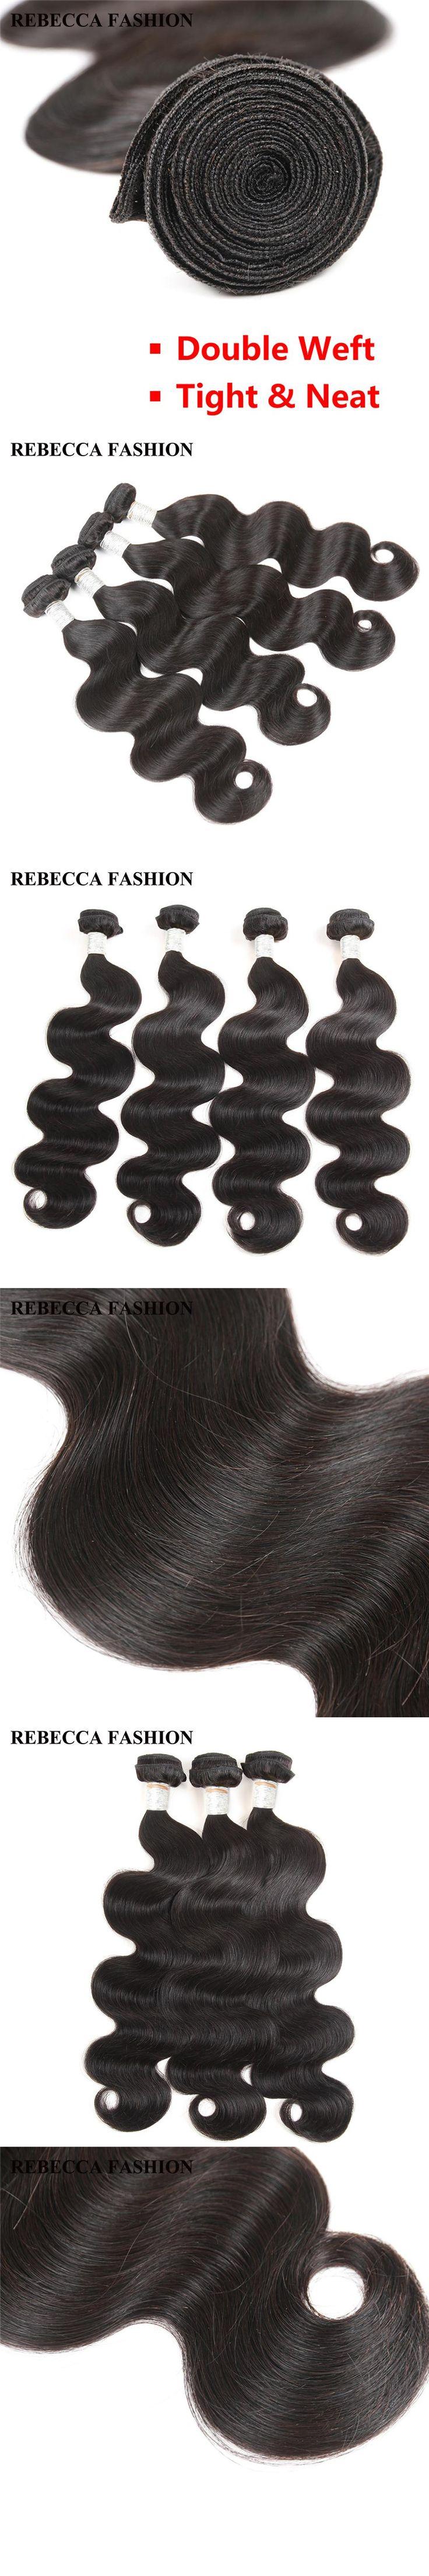 Rebecca Malaysian Hair Bundles Body Wave Remy Human Hair Extension 4 Bundles Hair Weft  Salon Bundle Hair Weave 8 to 30 inch